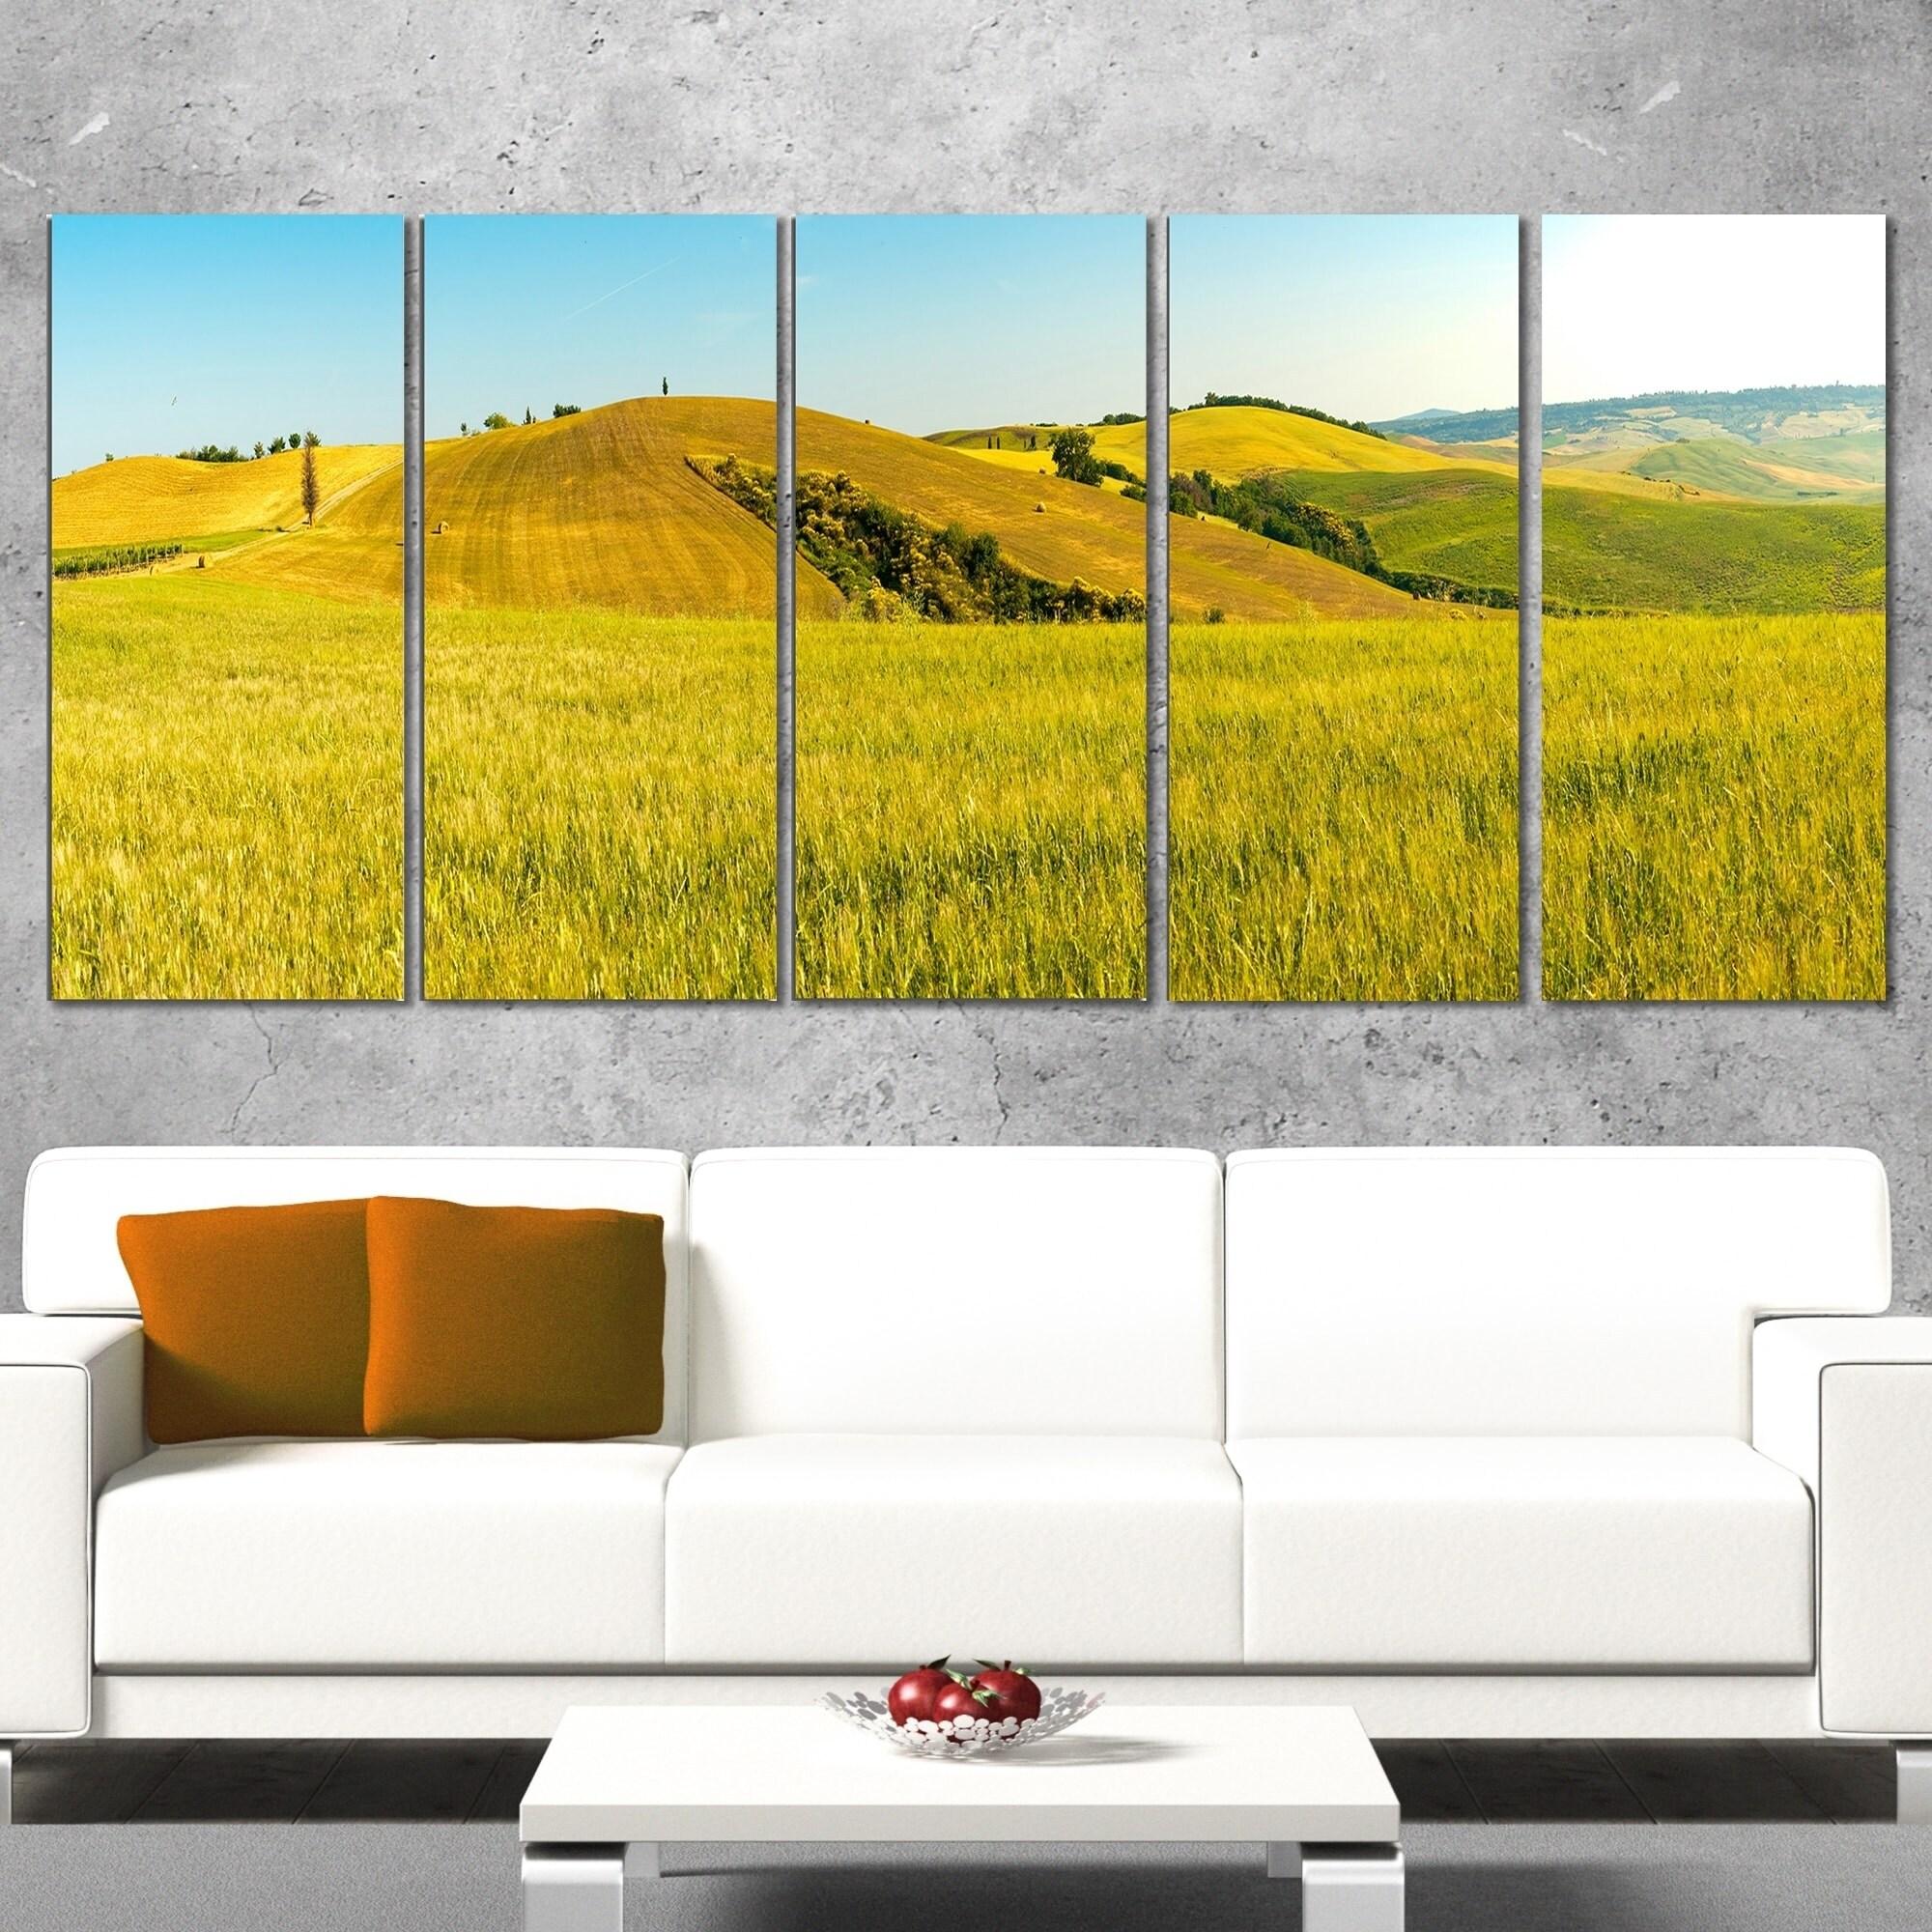 Shop Tuscany Wheat Field on Sunny Day - Landscape Print Wall Artwork ...